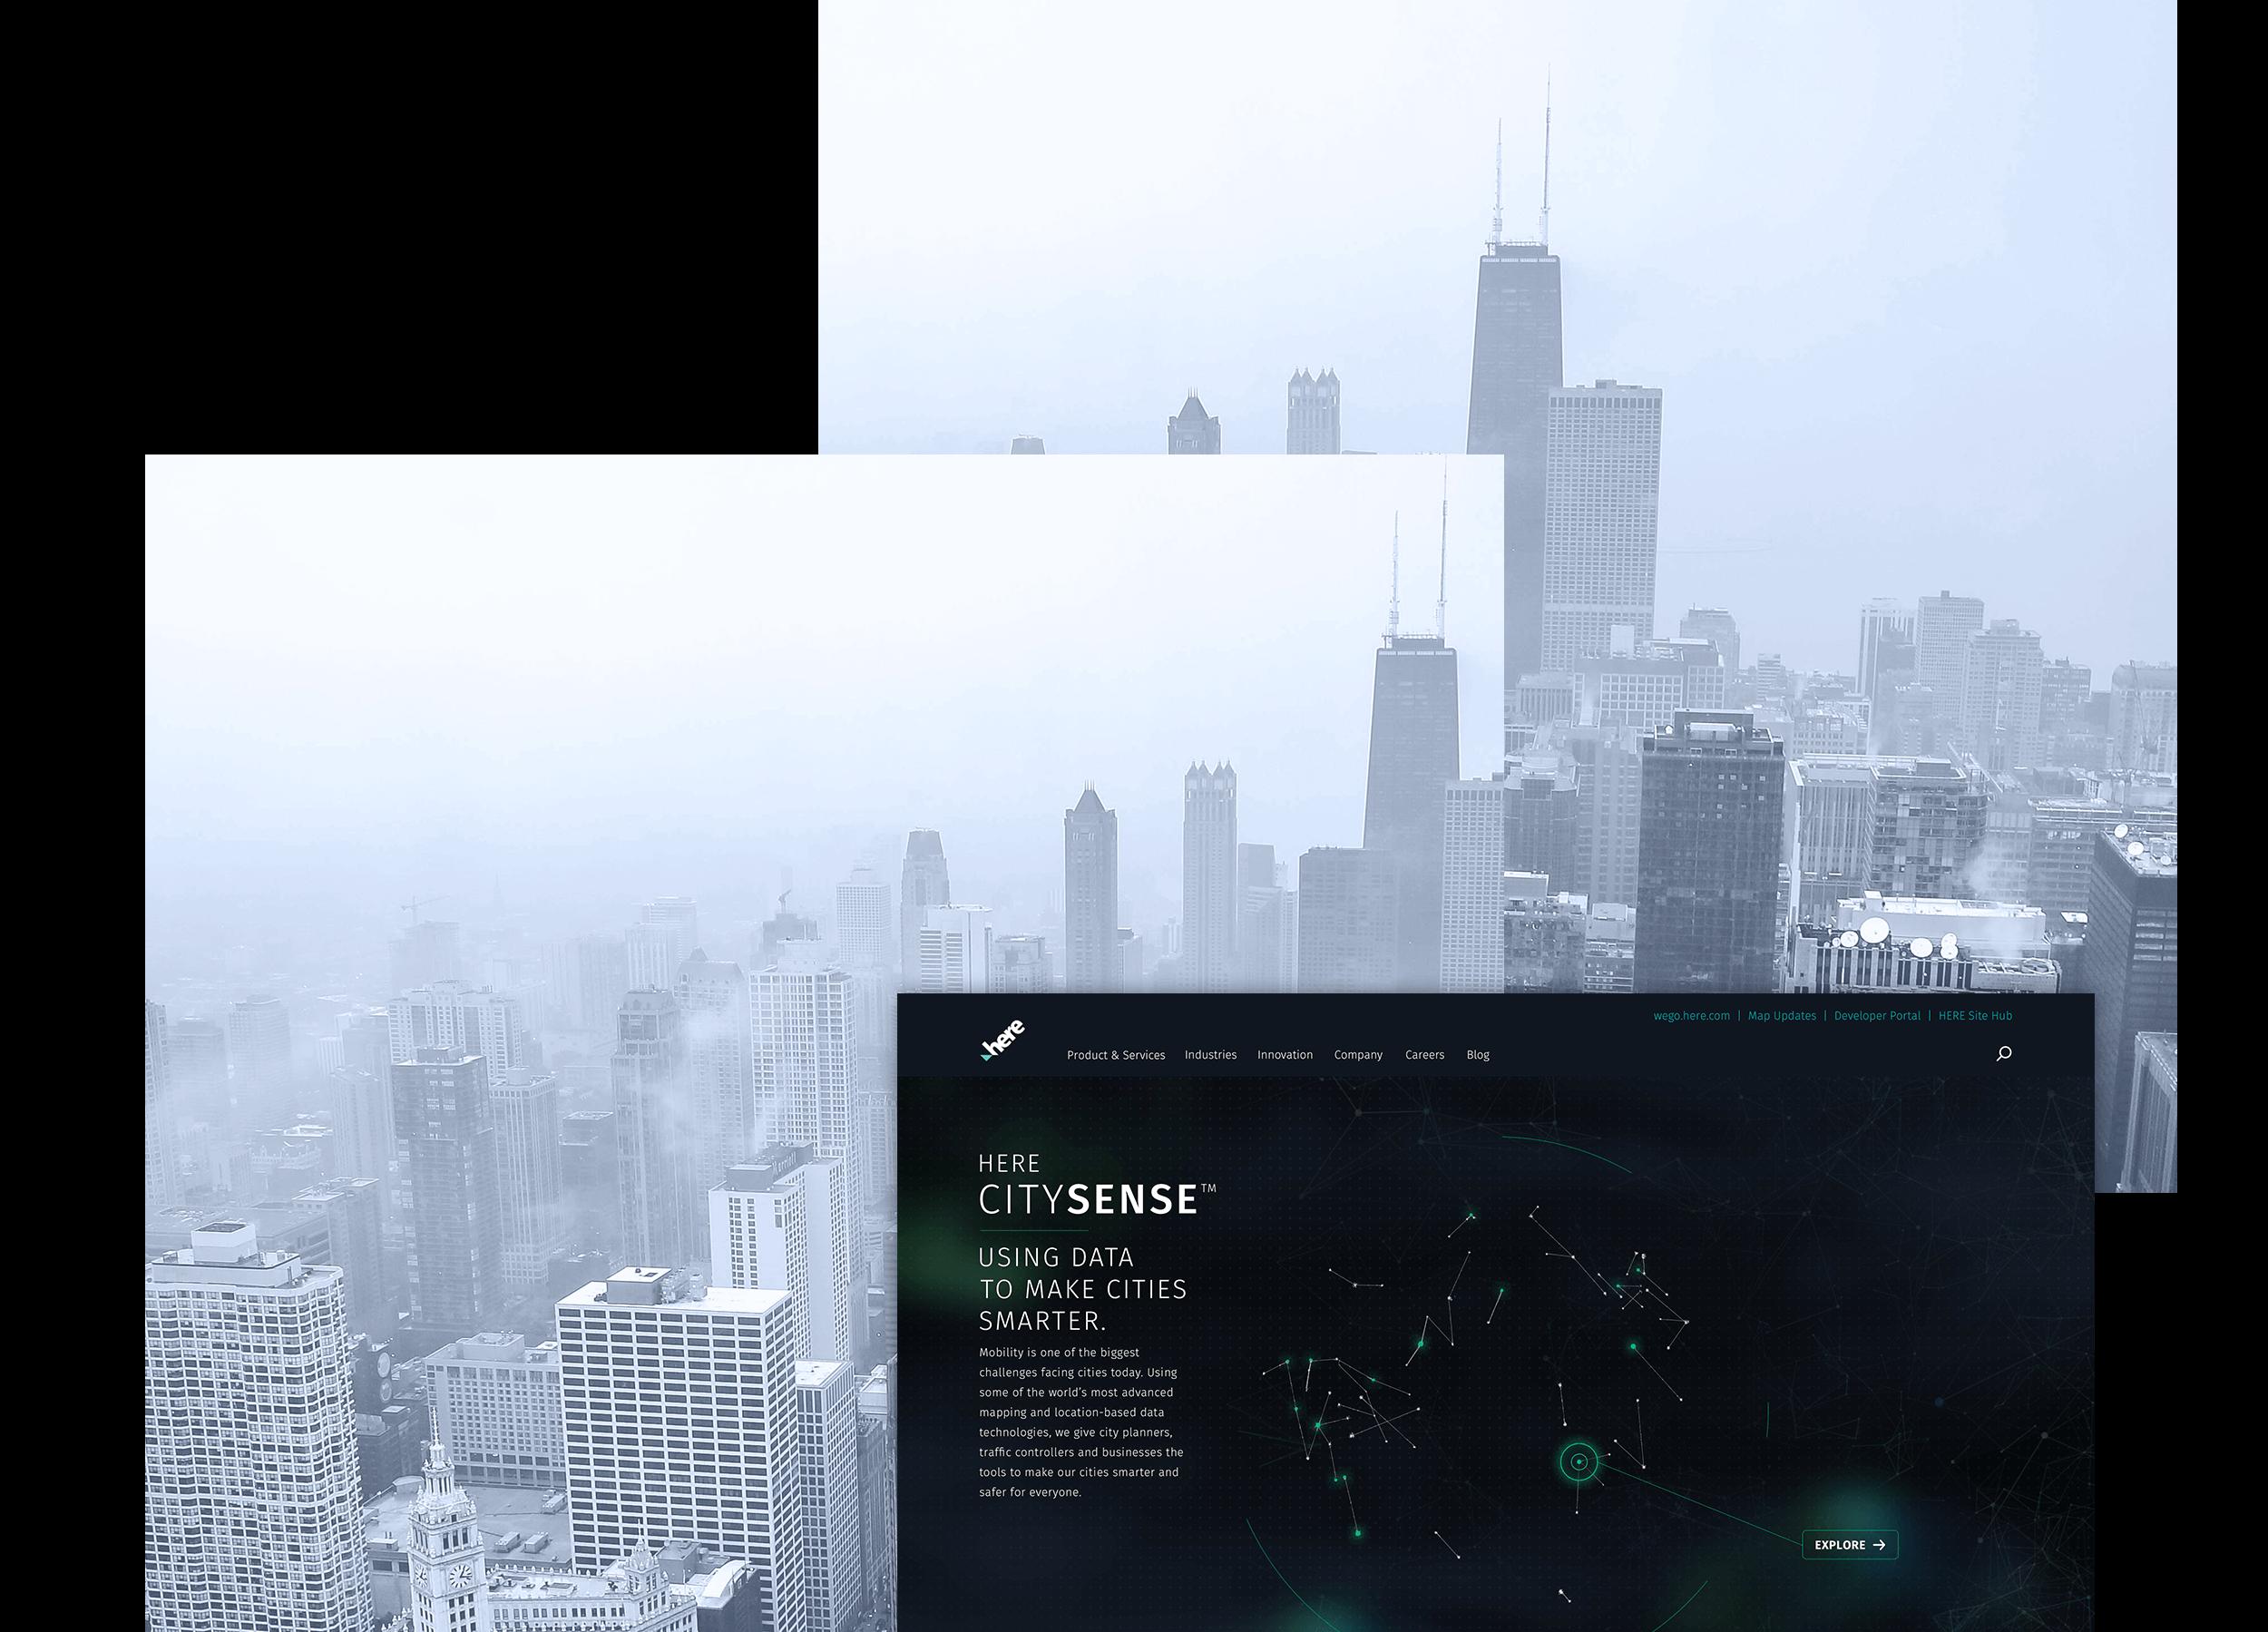 009-HERE-SmartCities-IMG01-03